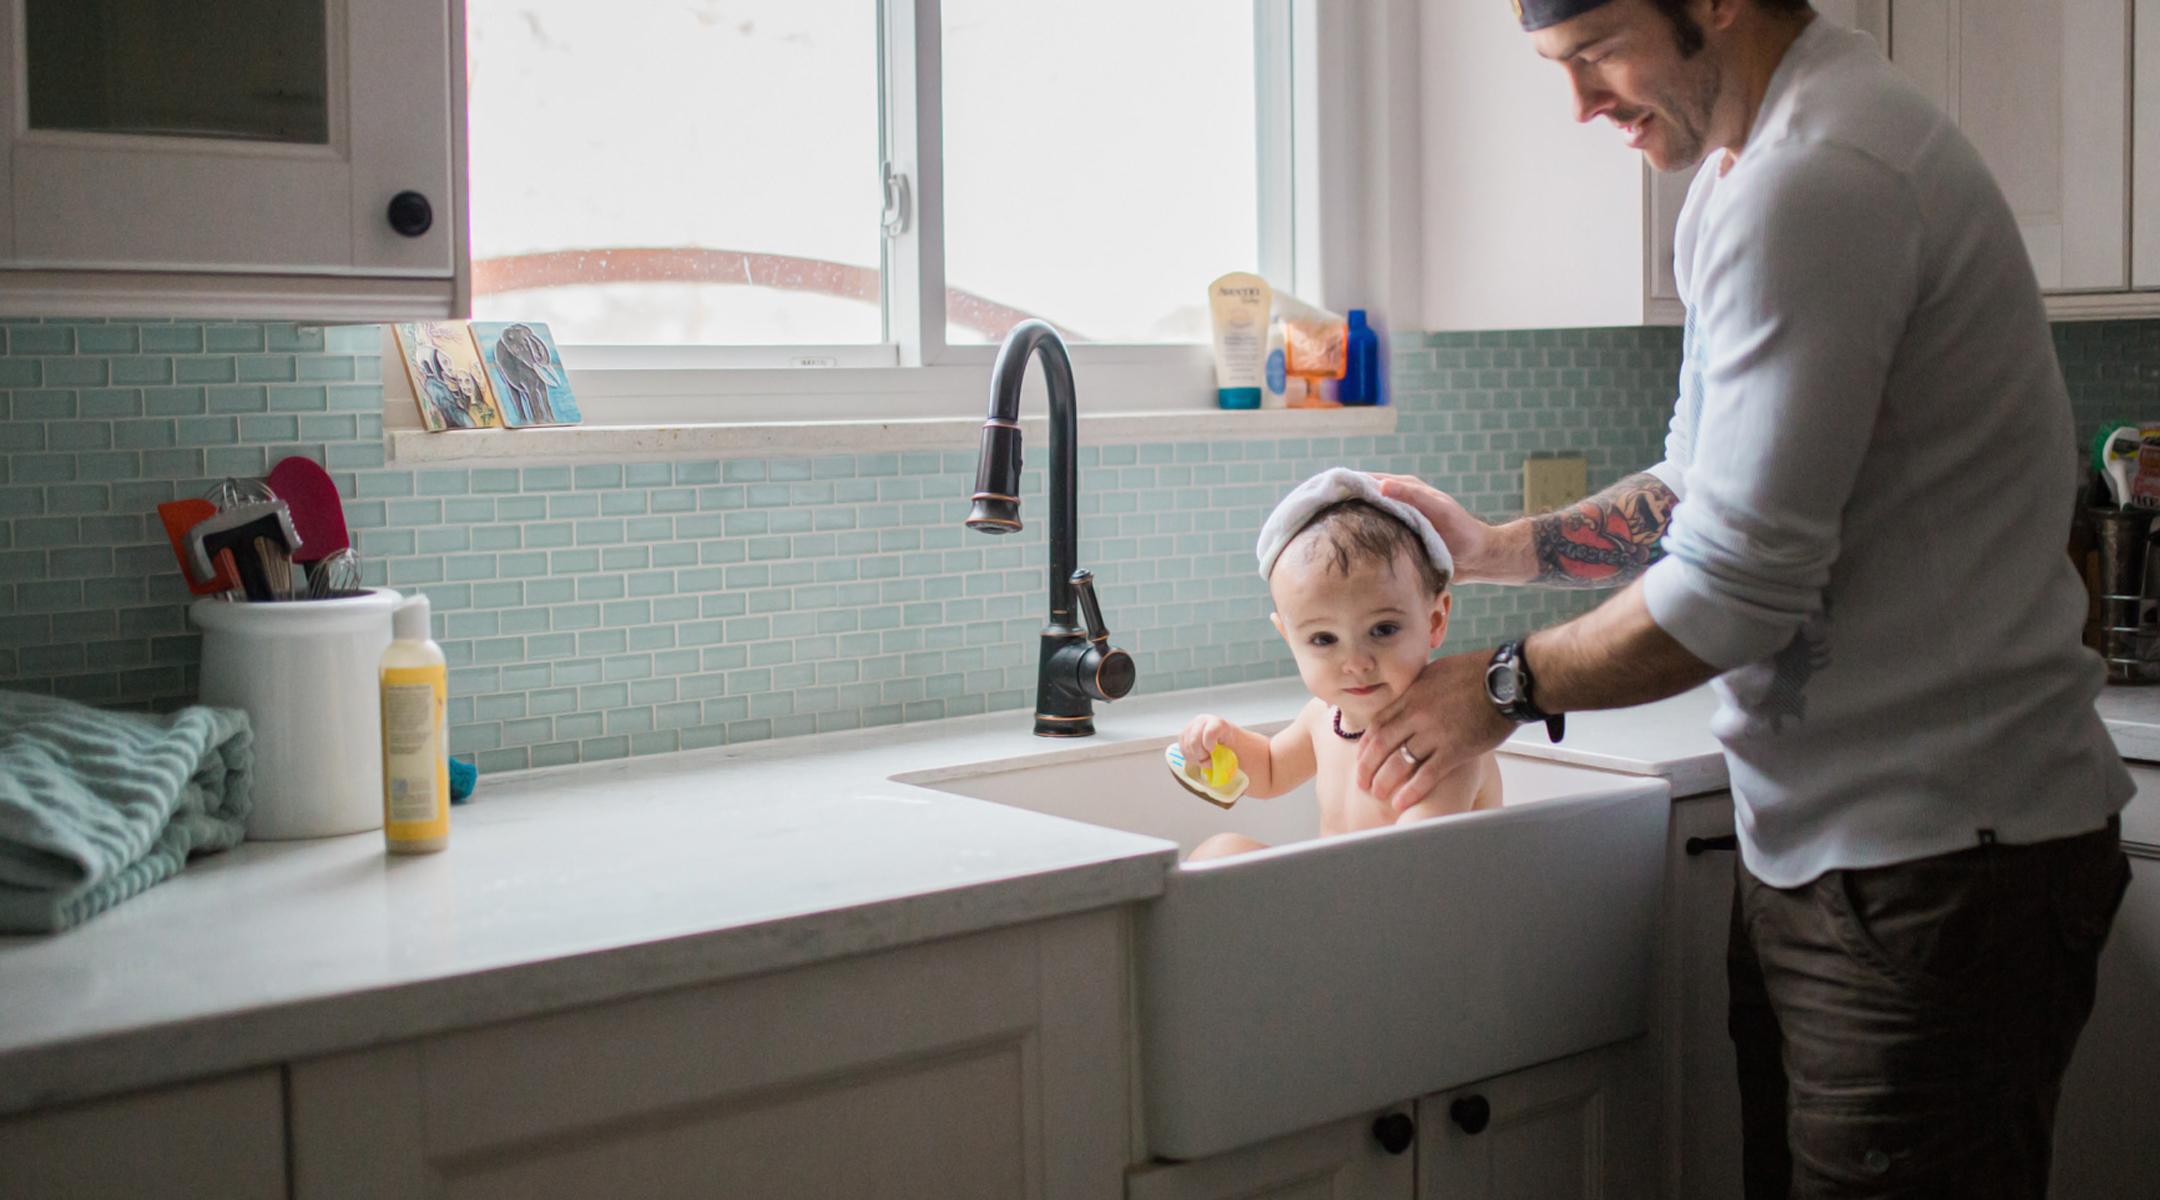 Kitchen Sink Baby Bath Novocom Top